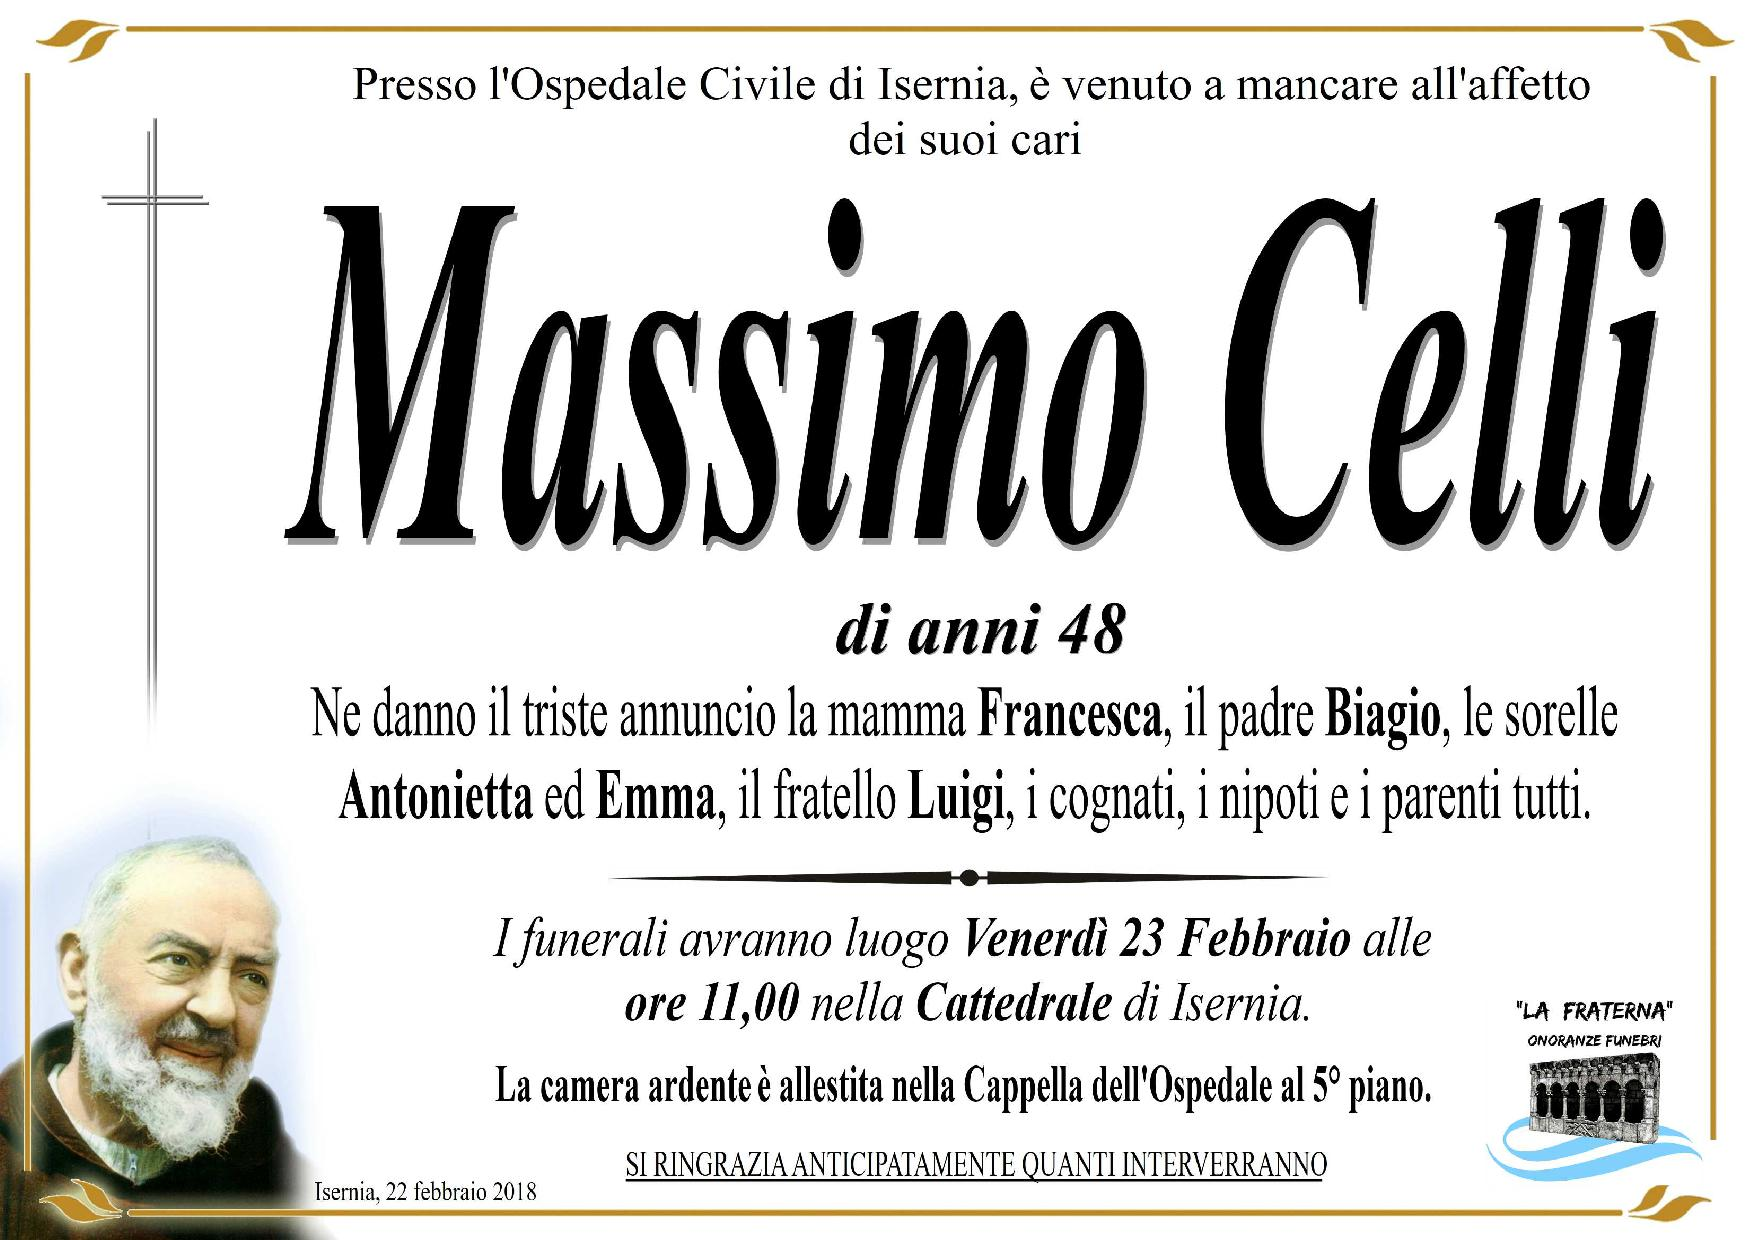 Massimo Celli – 22/02/2018 – Isernia – Onoranze Funebri La Fraterna